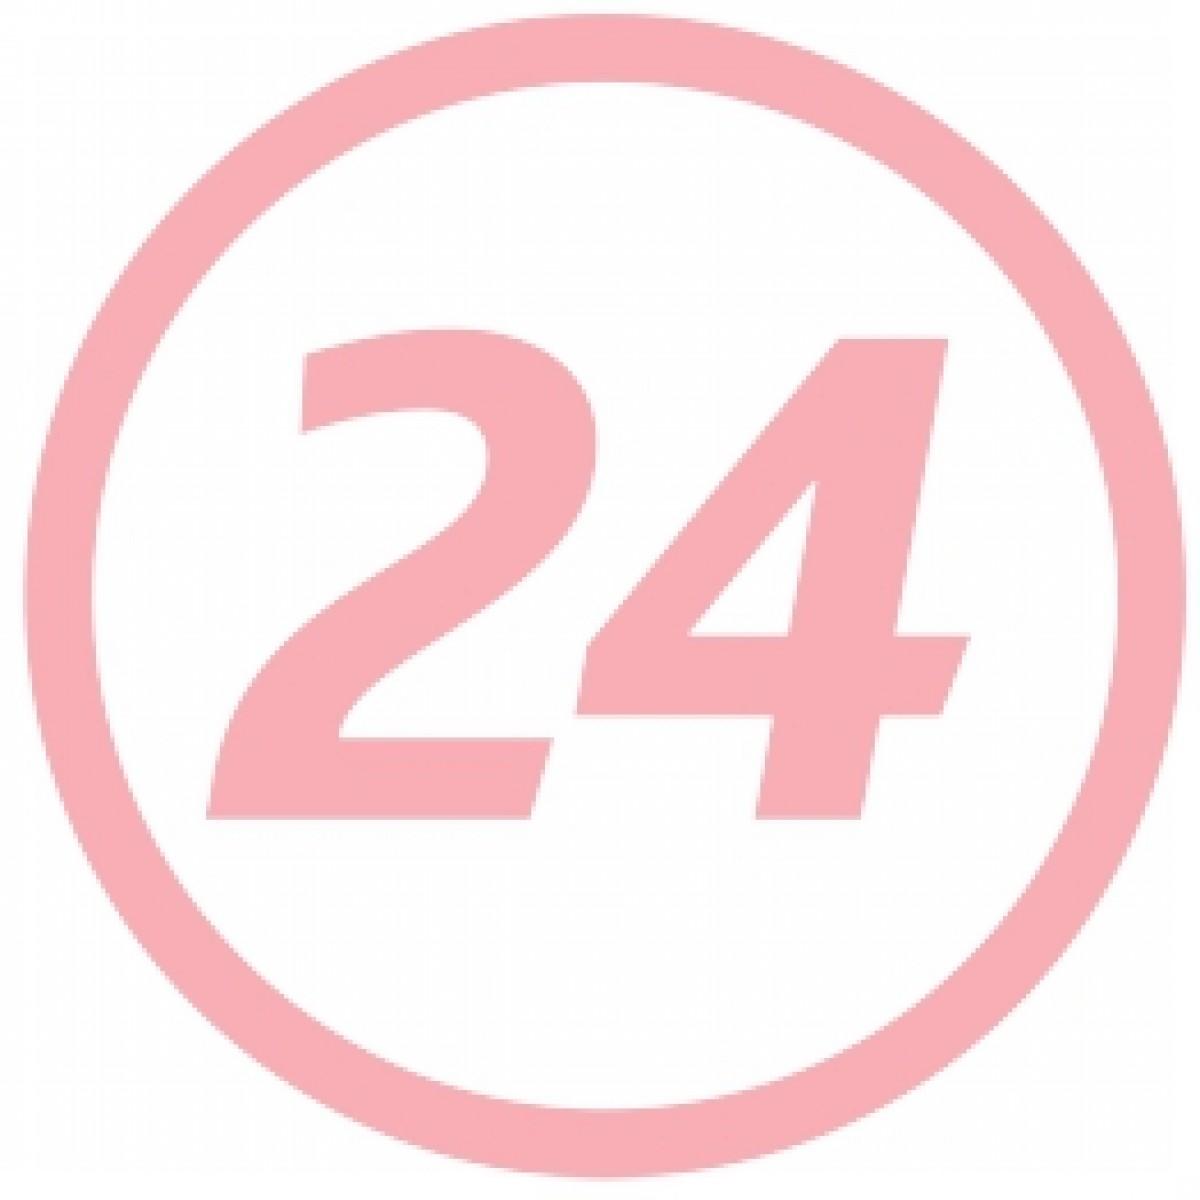 La Roche-Posay Toleriane Fluid 11 Fond De Ten Corector Beige Clair SPF 25, Fond De Ten, 30 Ml